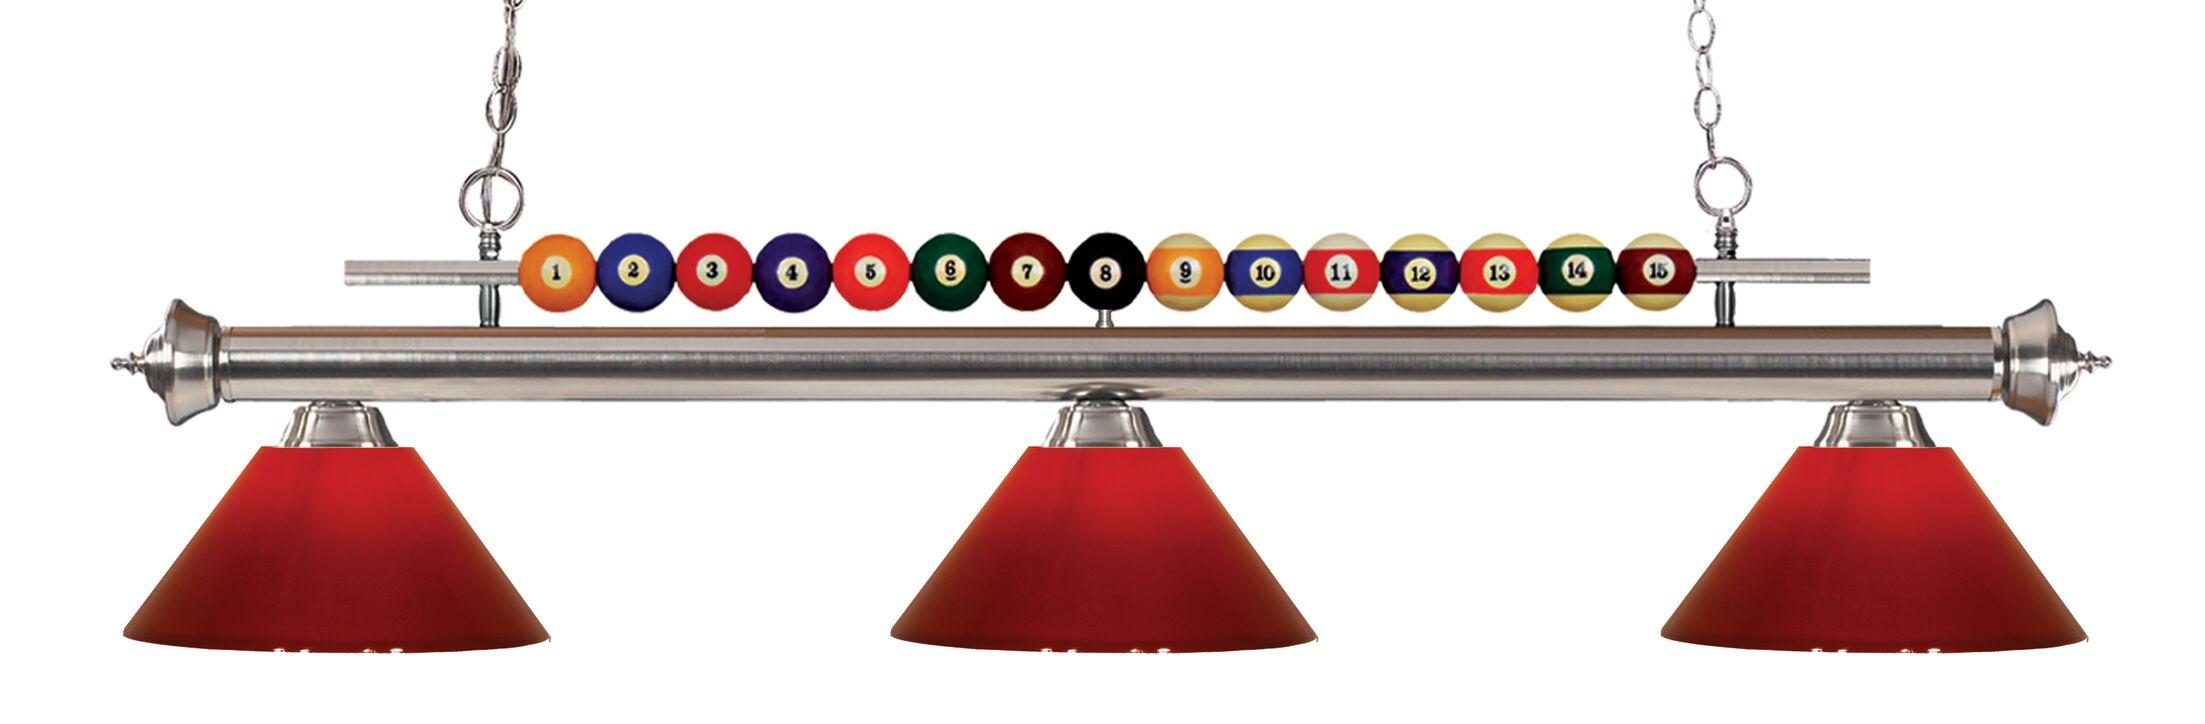 Chapa 3-Light Billiard Light Finish: Brushed Nickel, Shade Color: Red